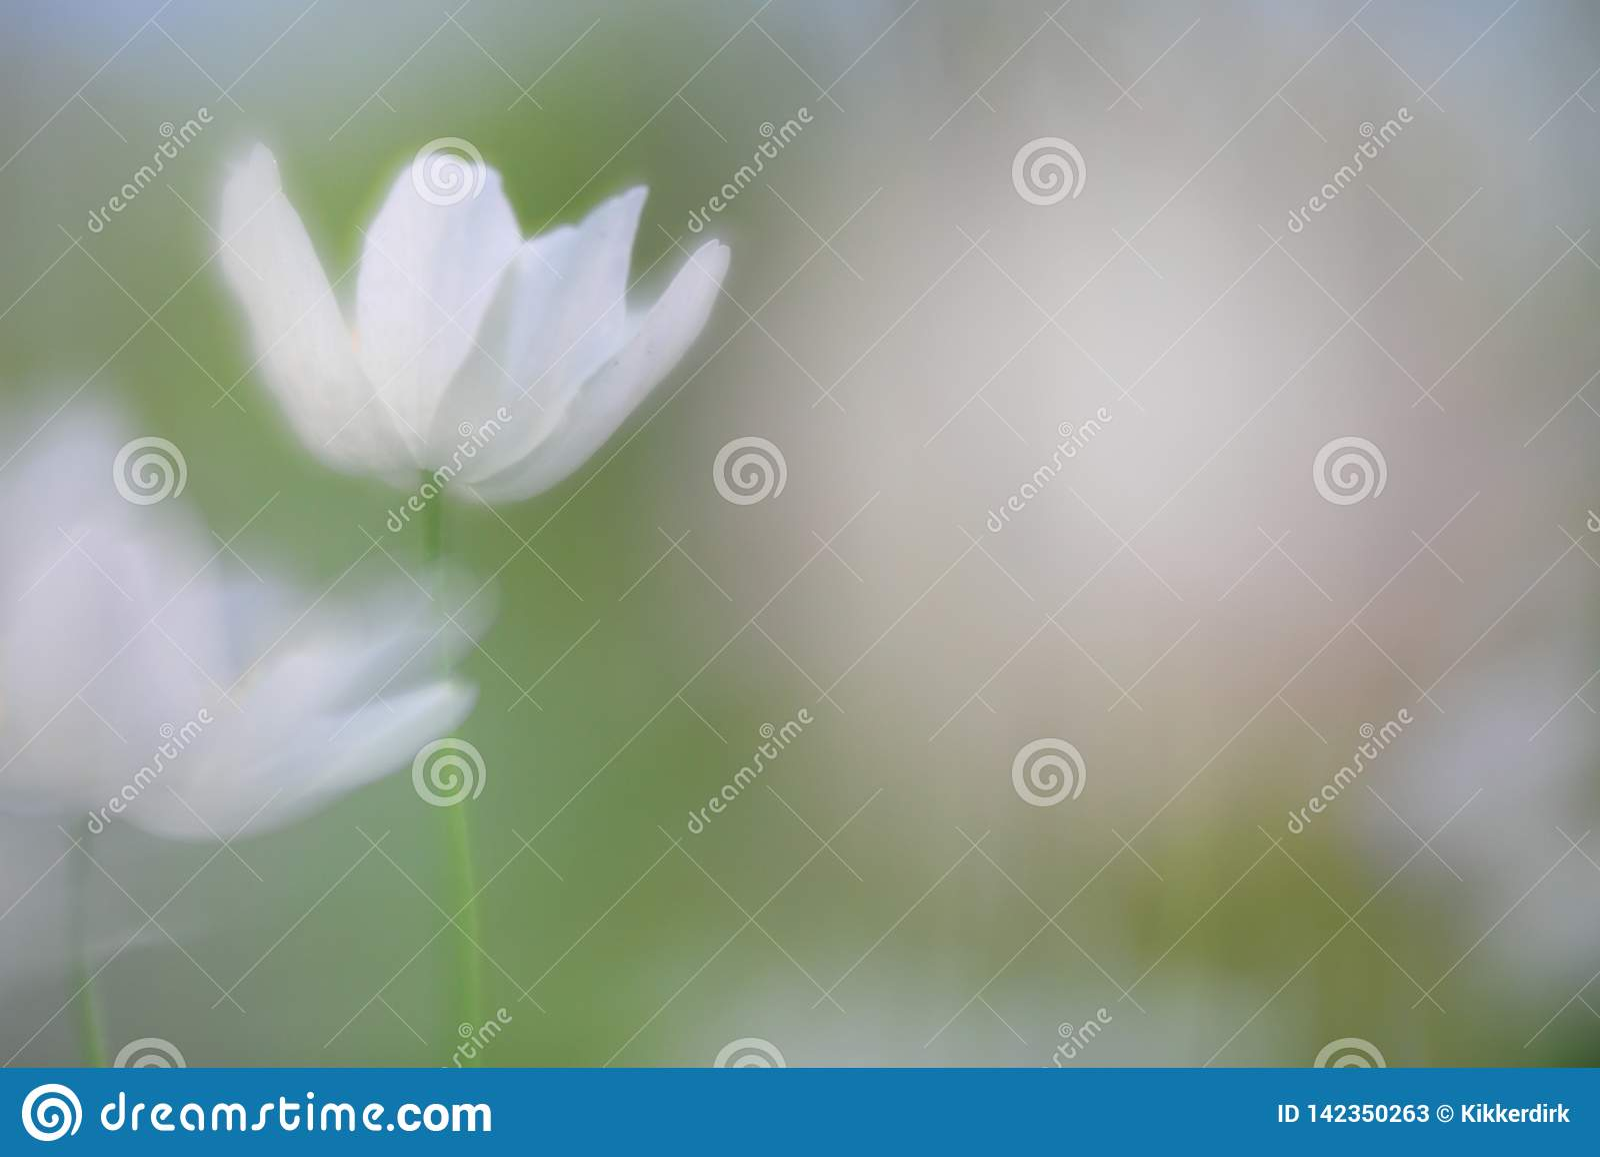 Spirit of a wood anemone